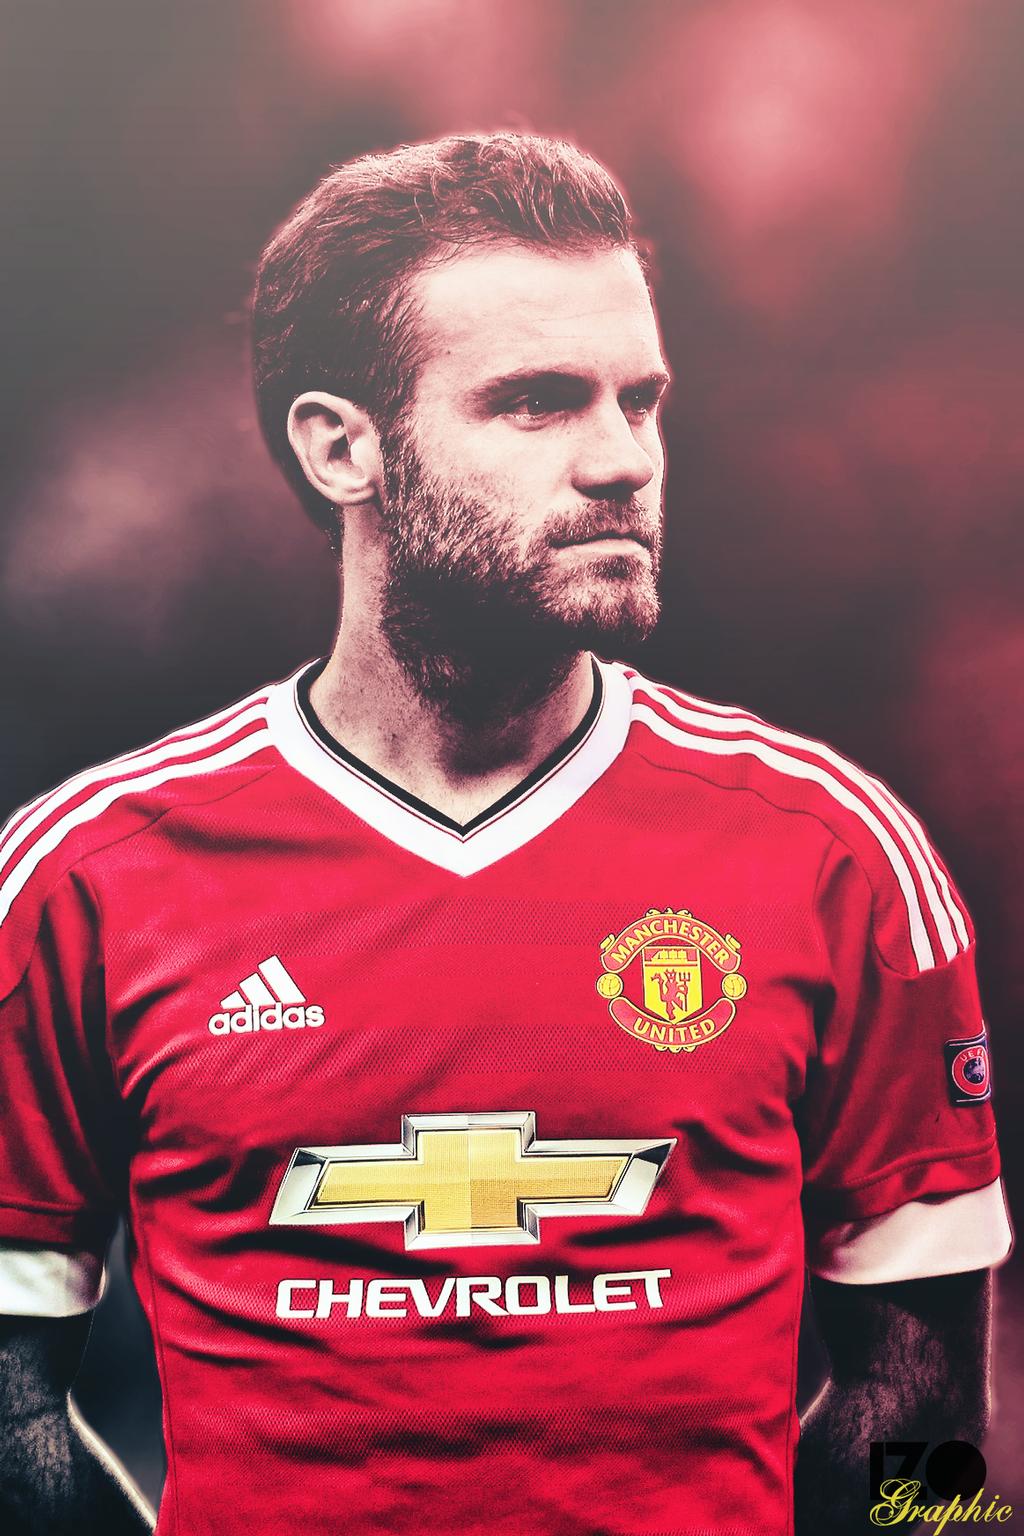 Juan Mata Manchester United Effect by izographic on DeviantArt